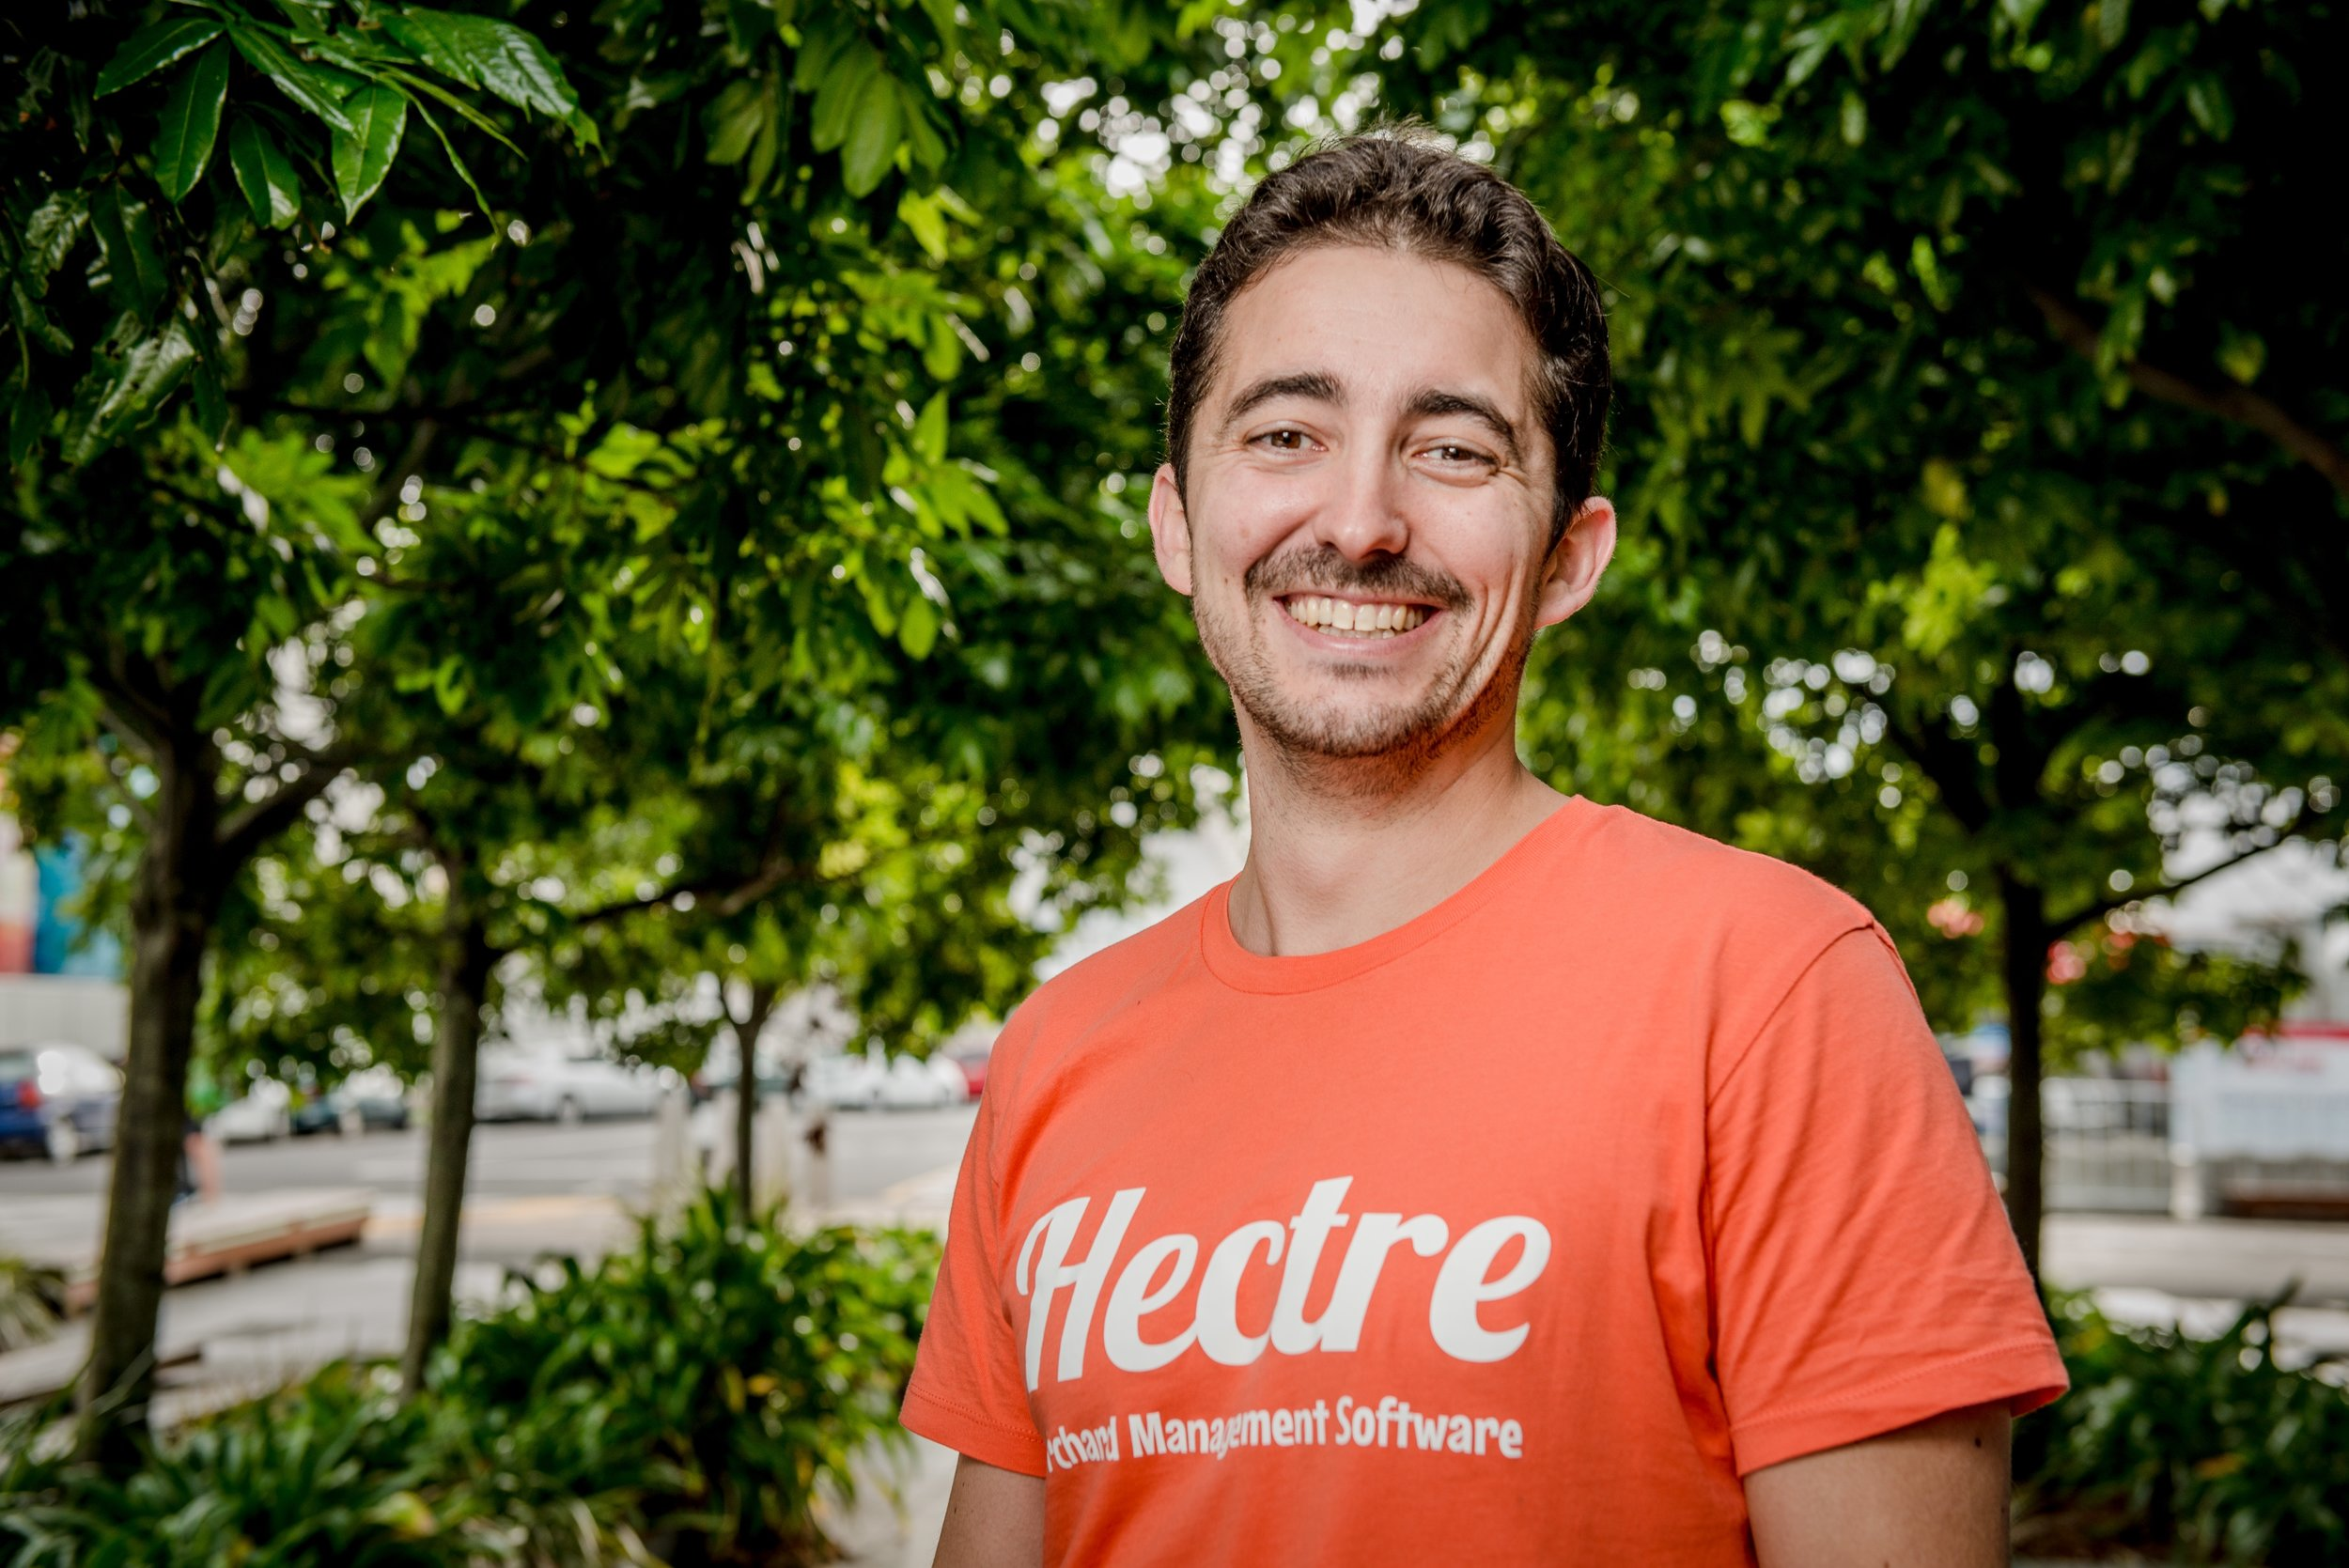 Sprout Alumni - Hectre Nico Gabbara